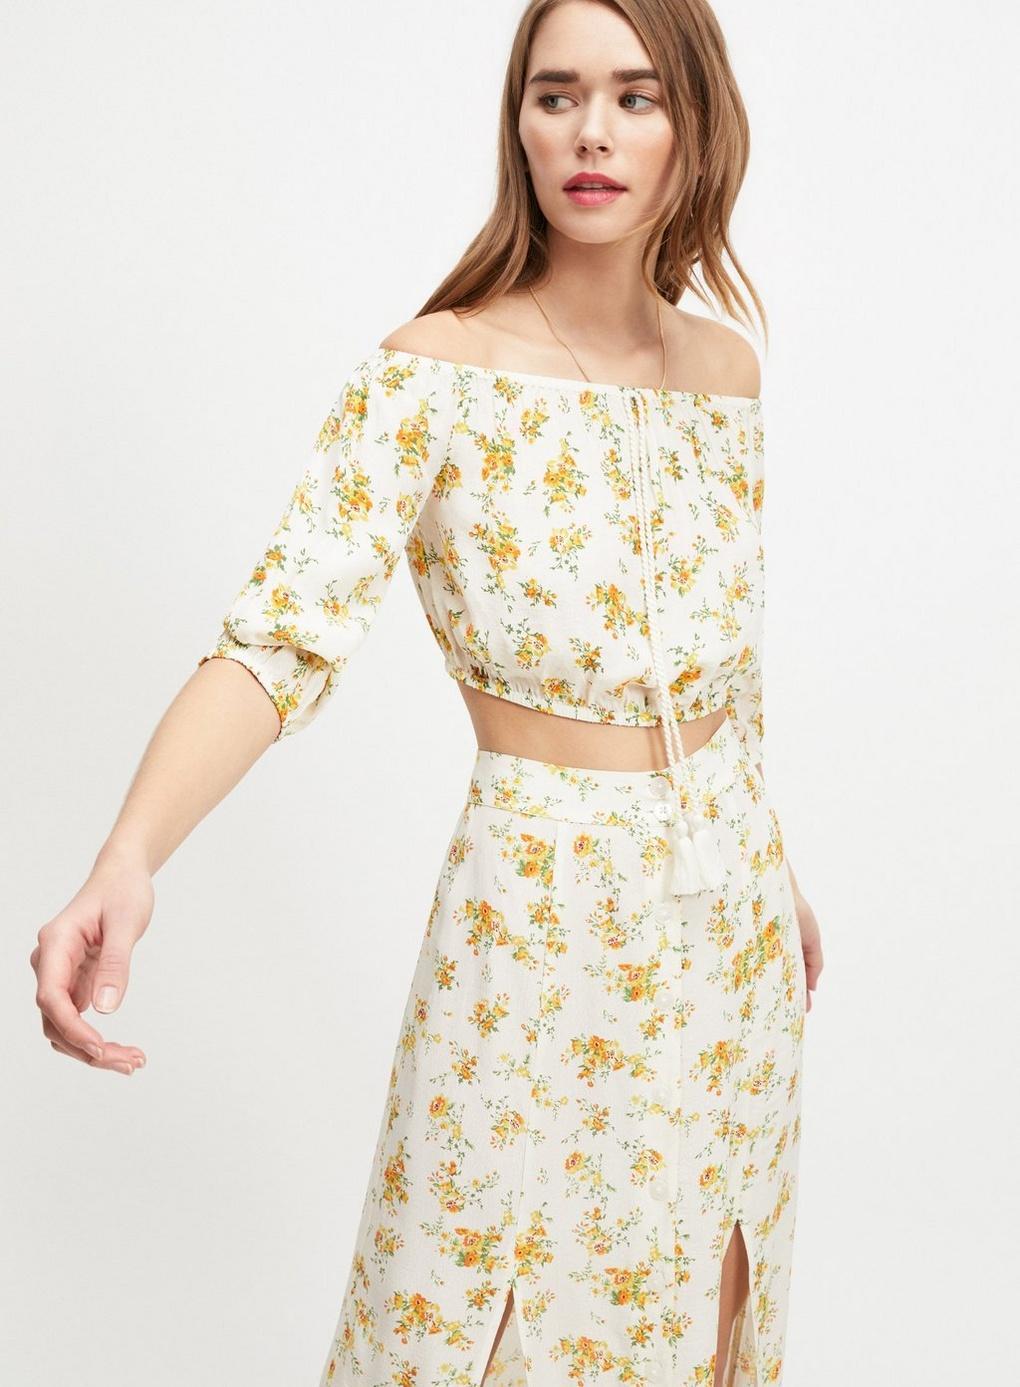 0fb5e31380e Lyst - Miss Selfridge Ivory Floral Print Bardot Top in White